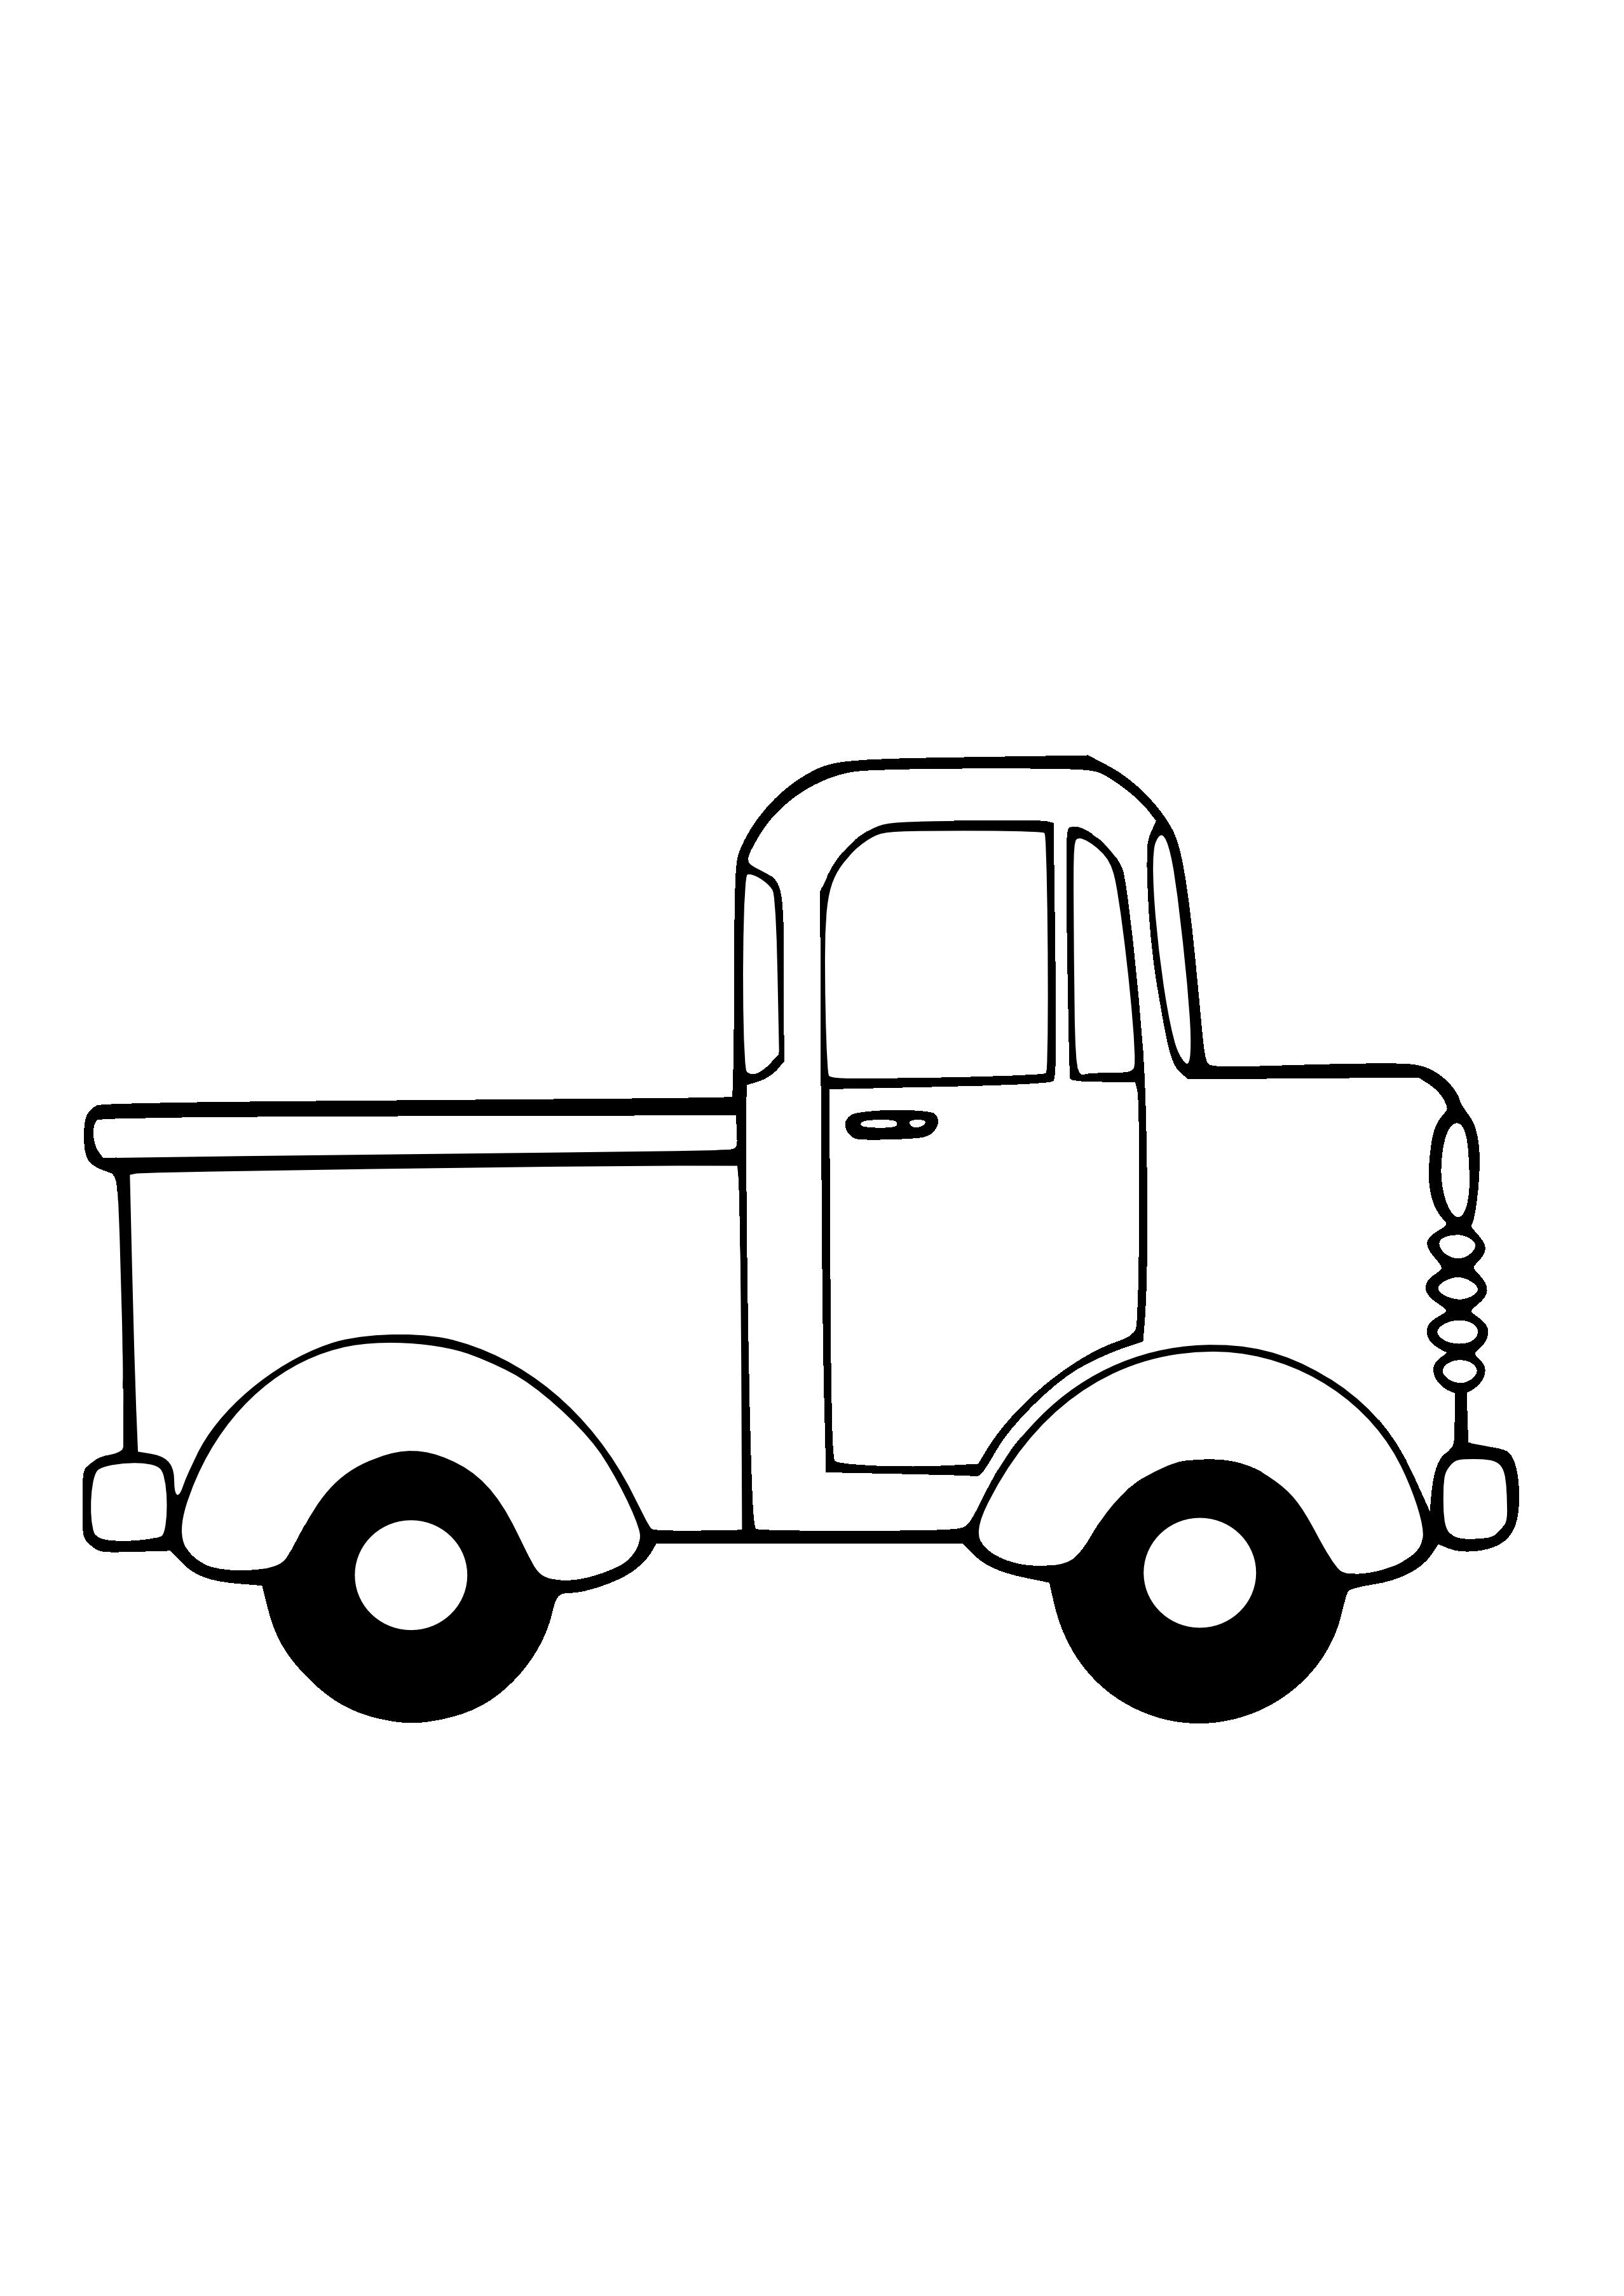 Firetruck clipart draw. Toy truck panda free